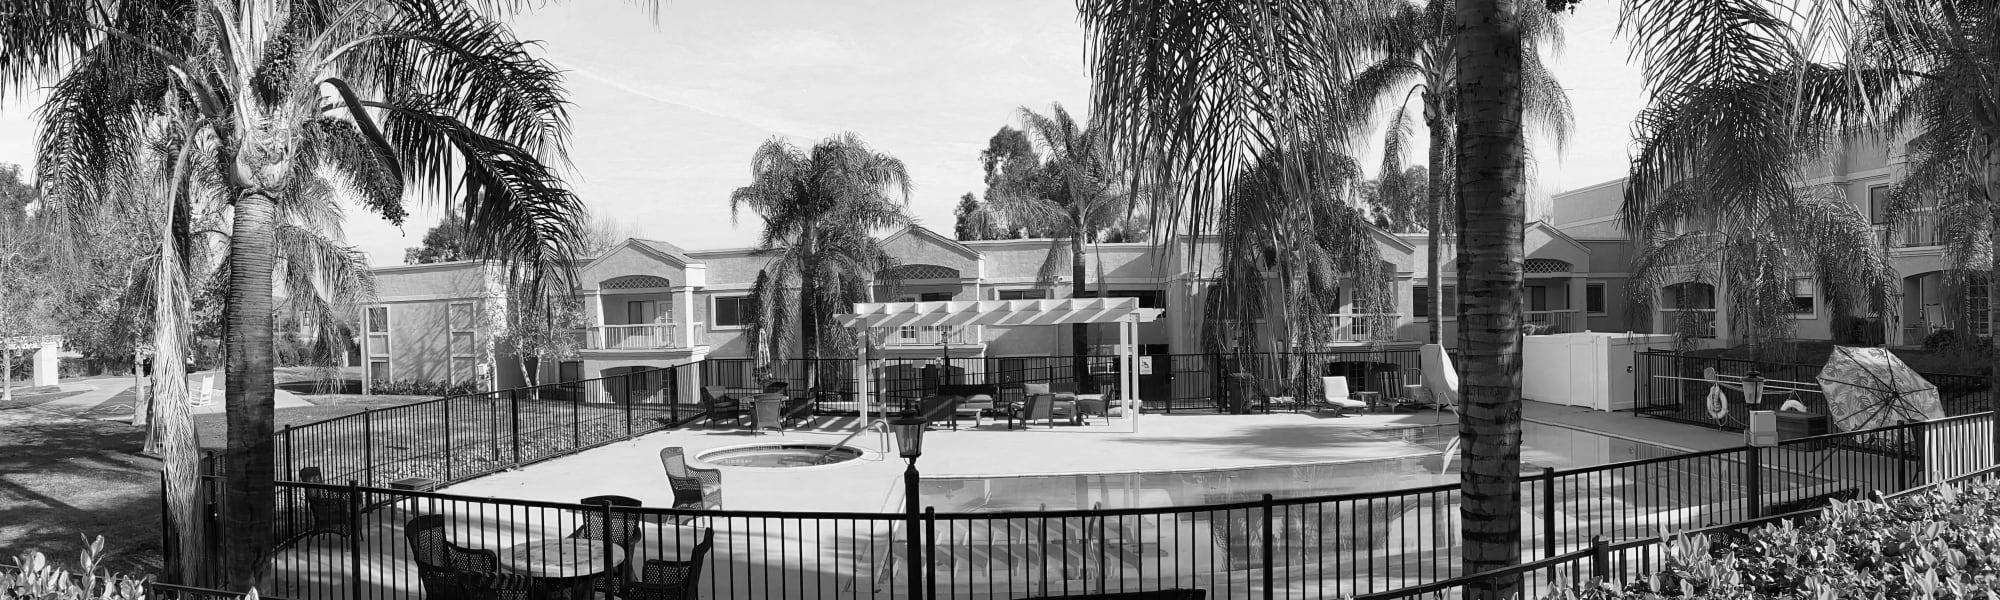 Directions to Pacifica Senior Living Menifee in Sun City, California.